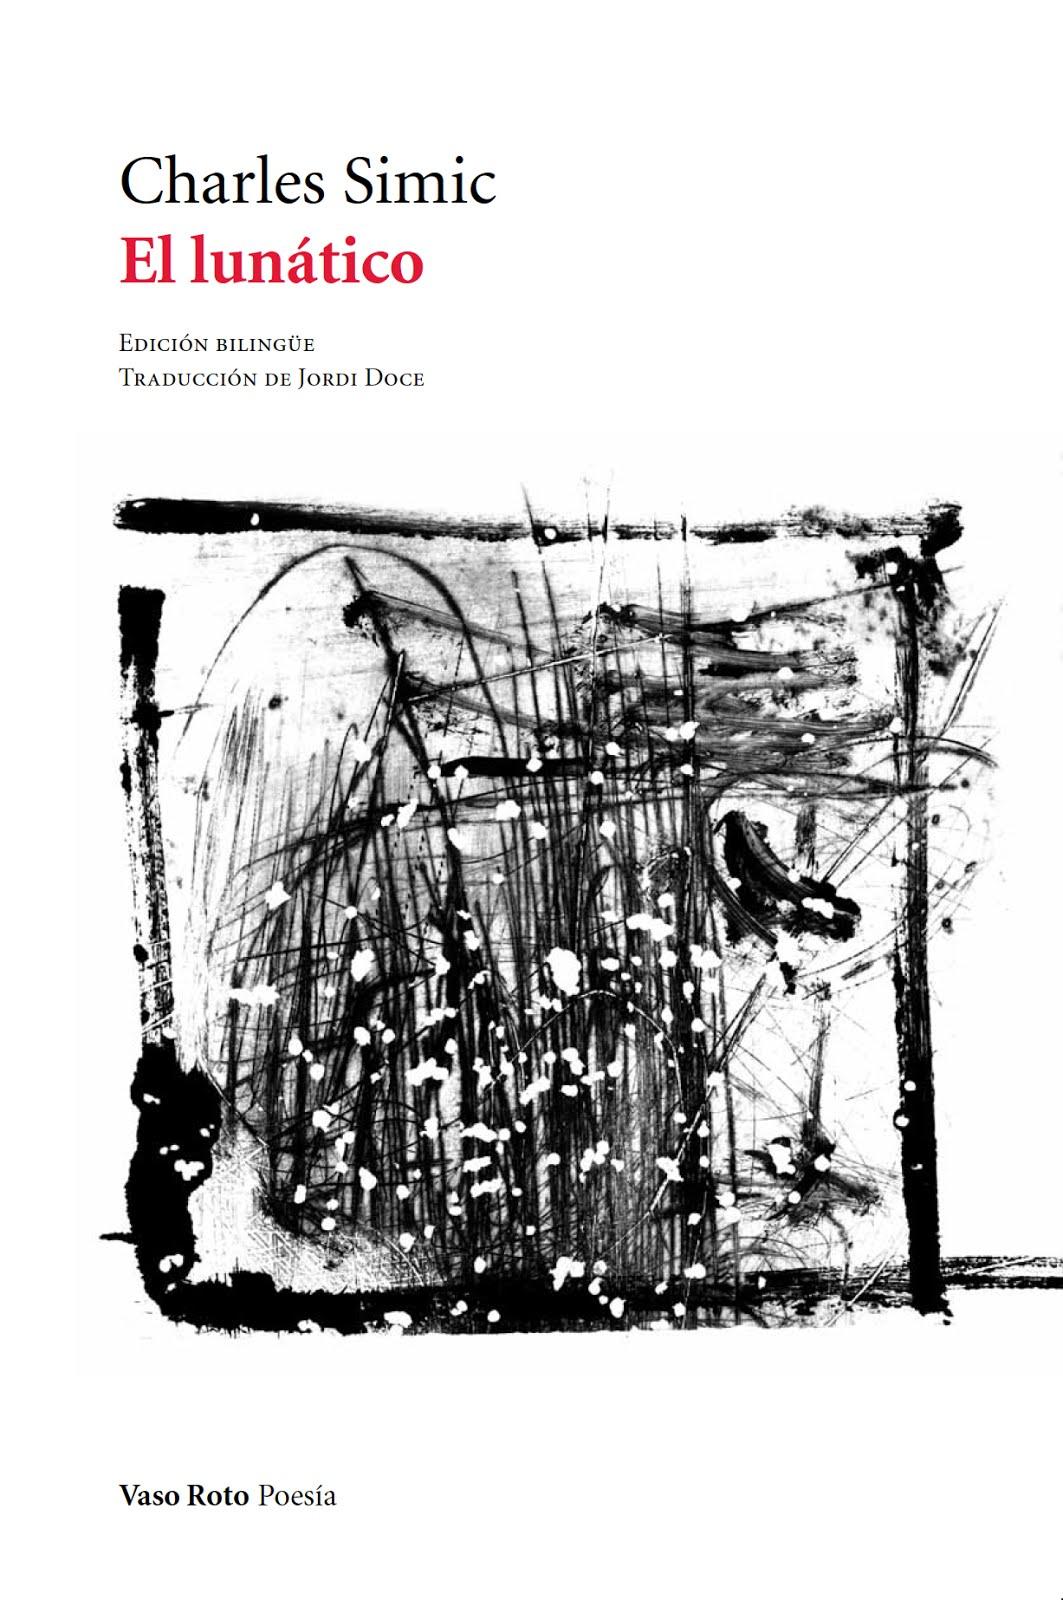 Simic / El lunático